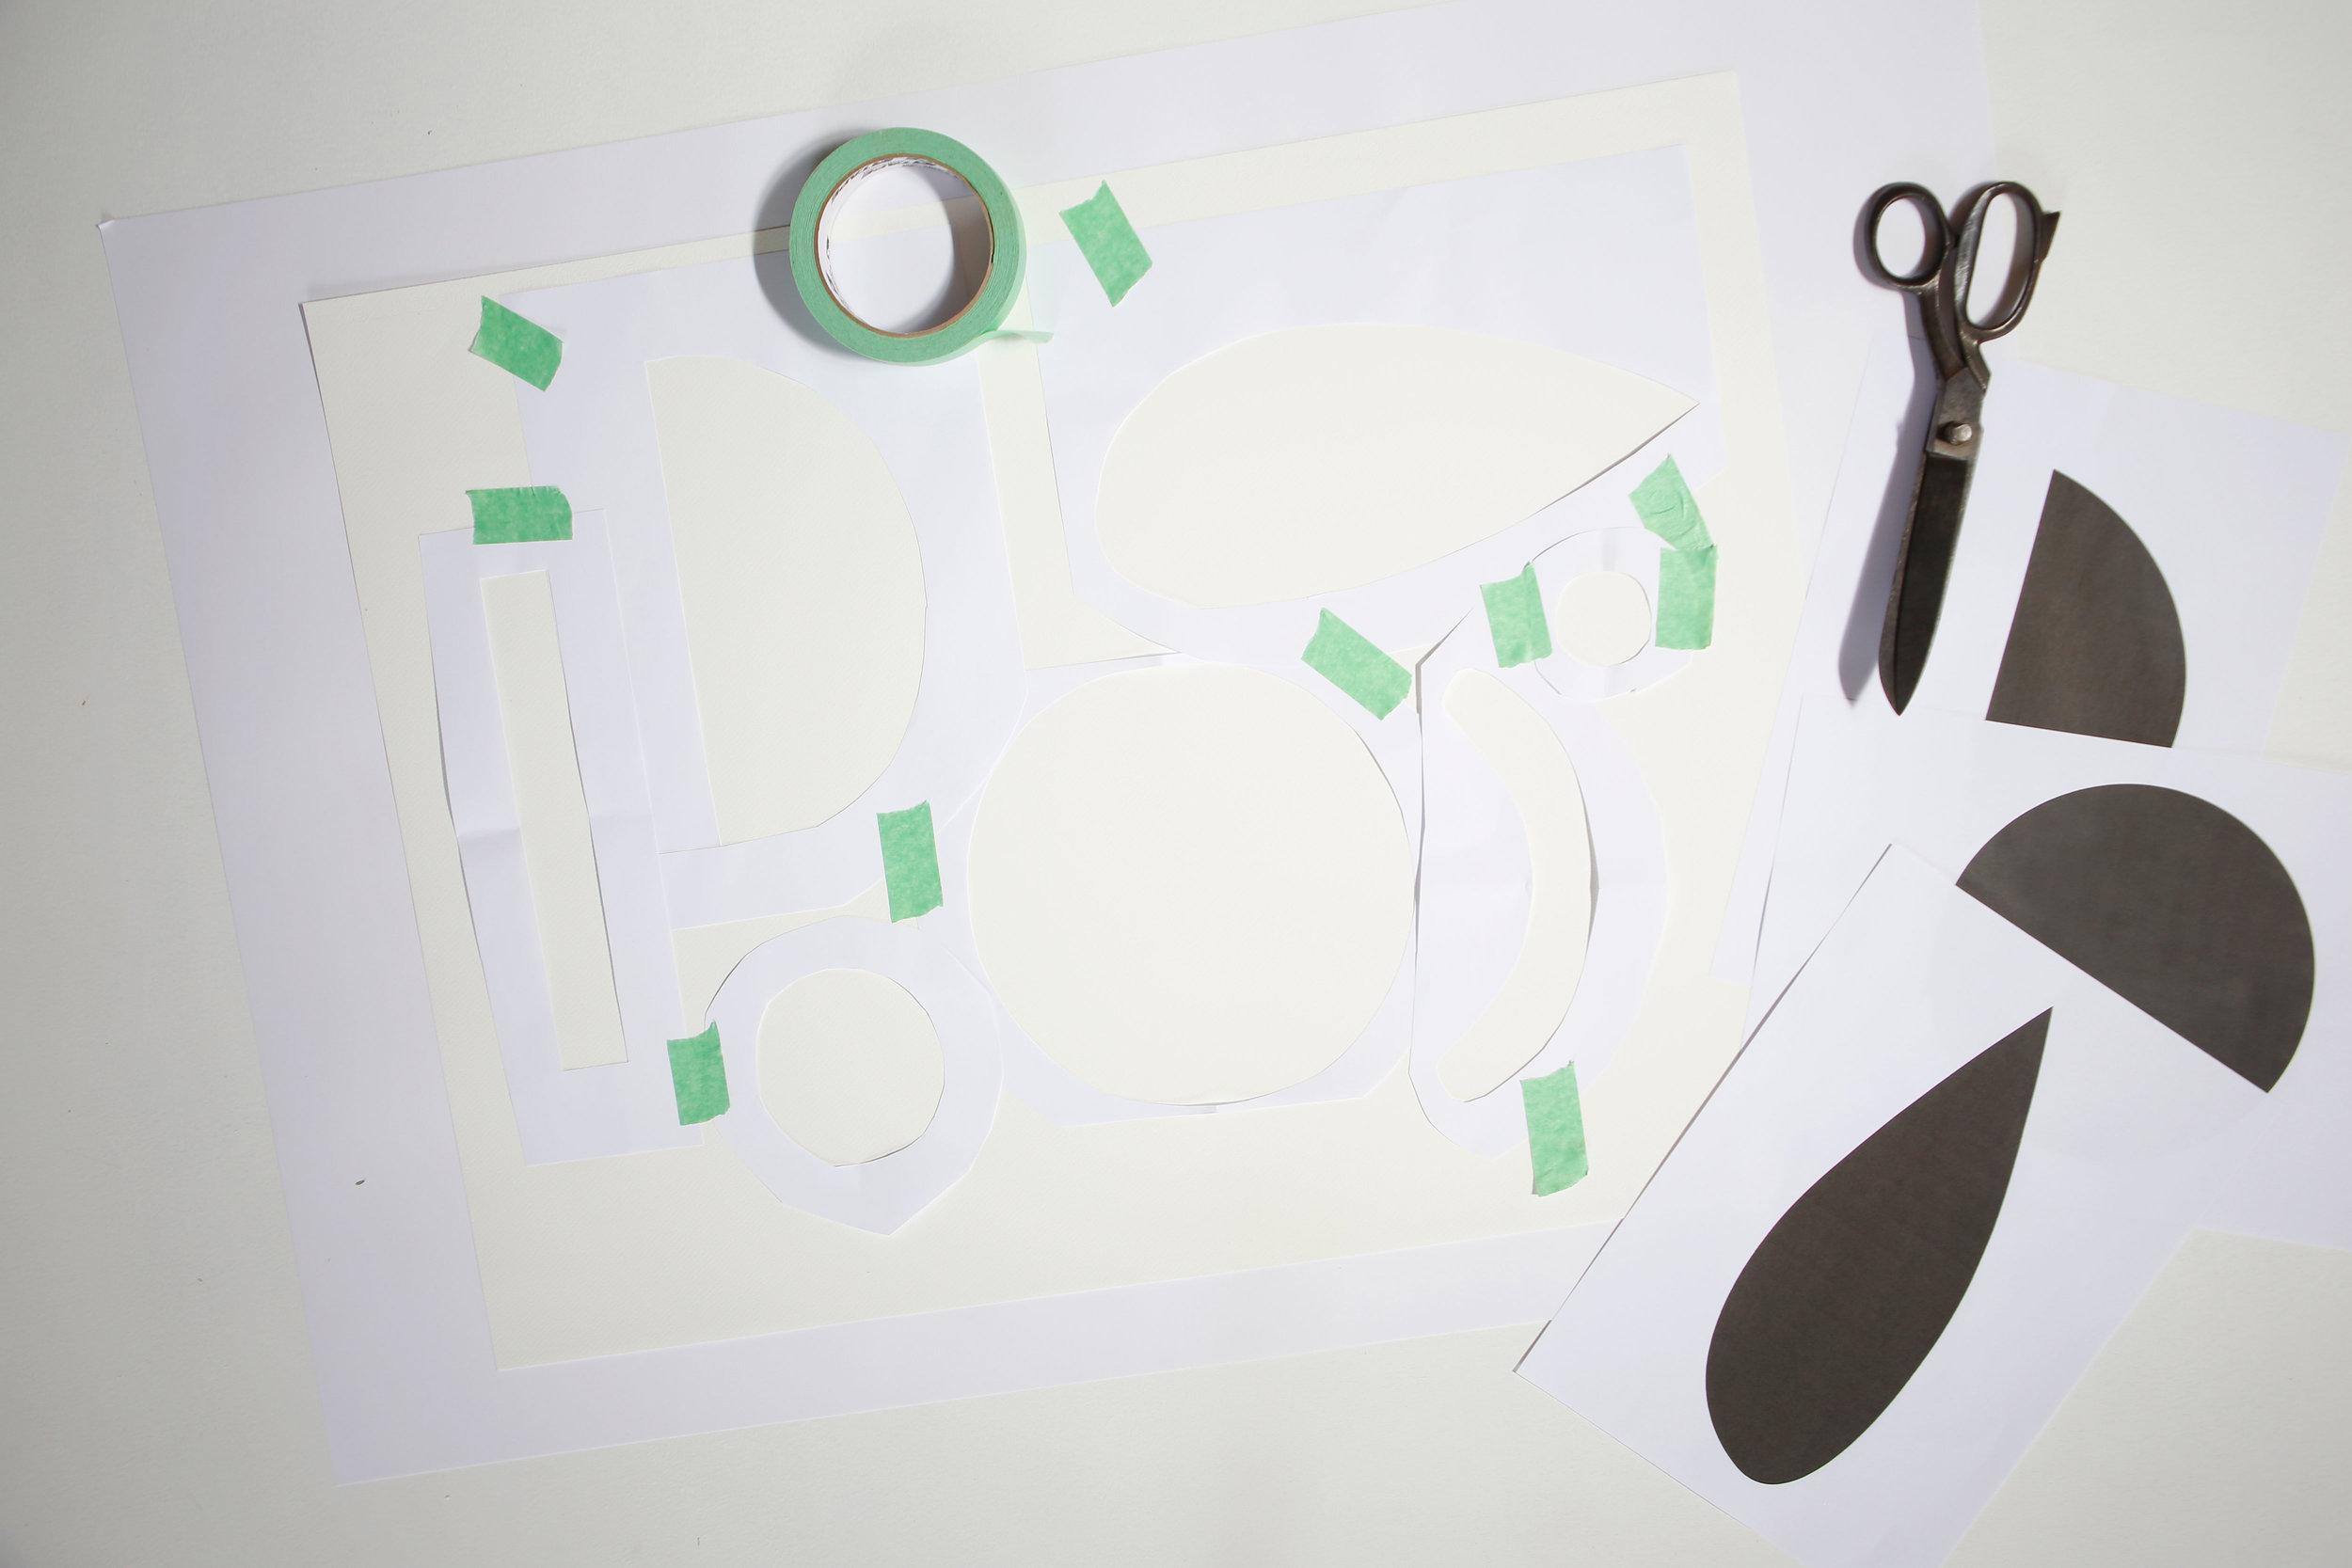 Resene-AbstractArt-DIY-Layout.jpg